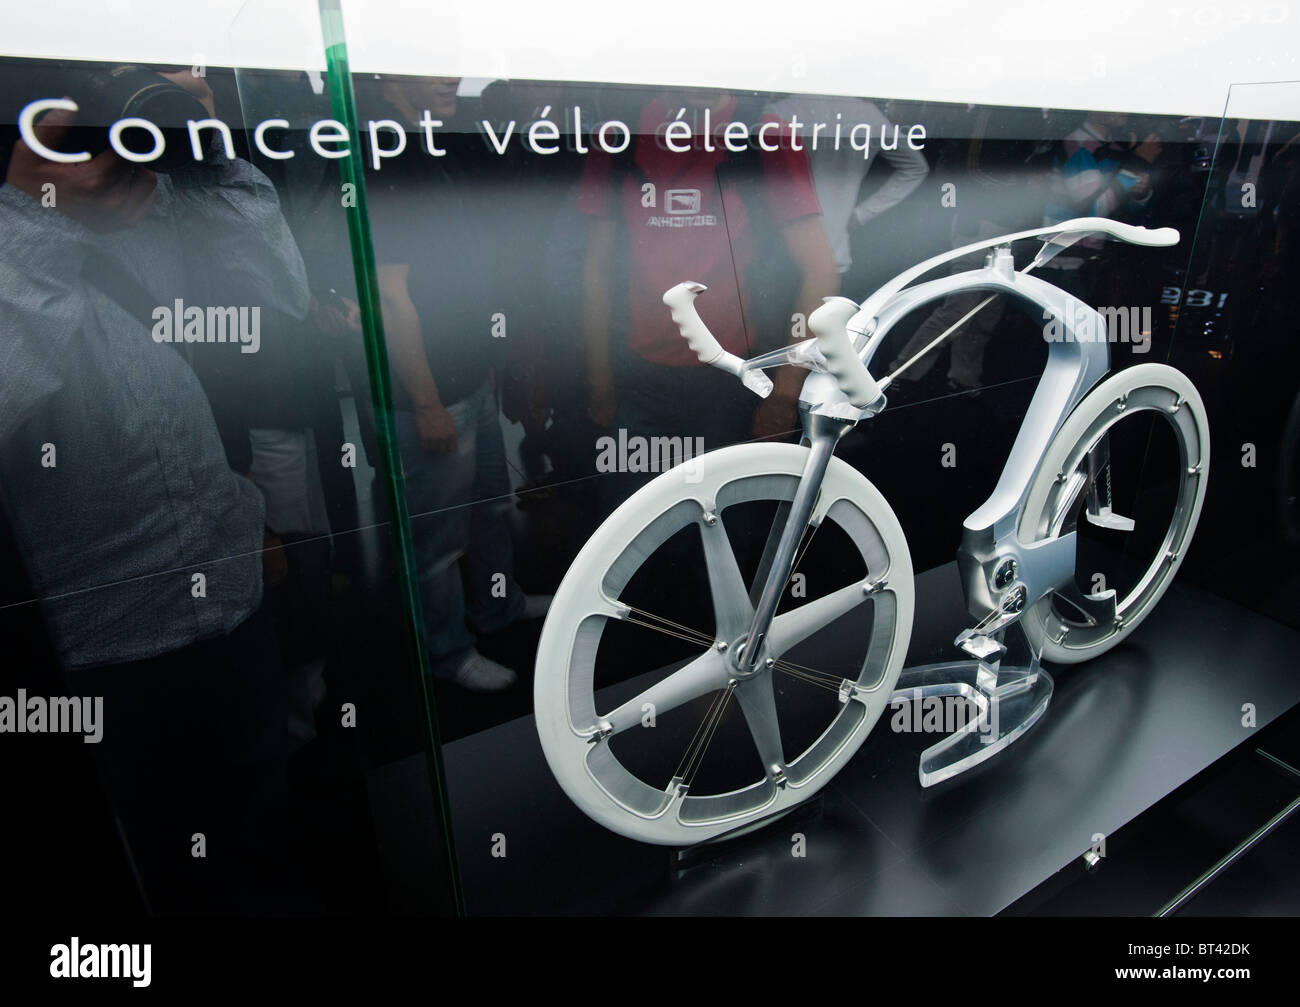 Concepto de bicicleta eléctrica por Peugeot en Paris Motor Show 2010 Imagen De Stock